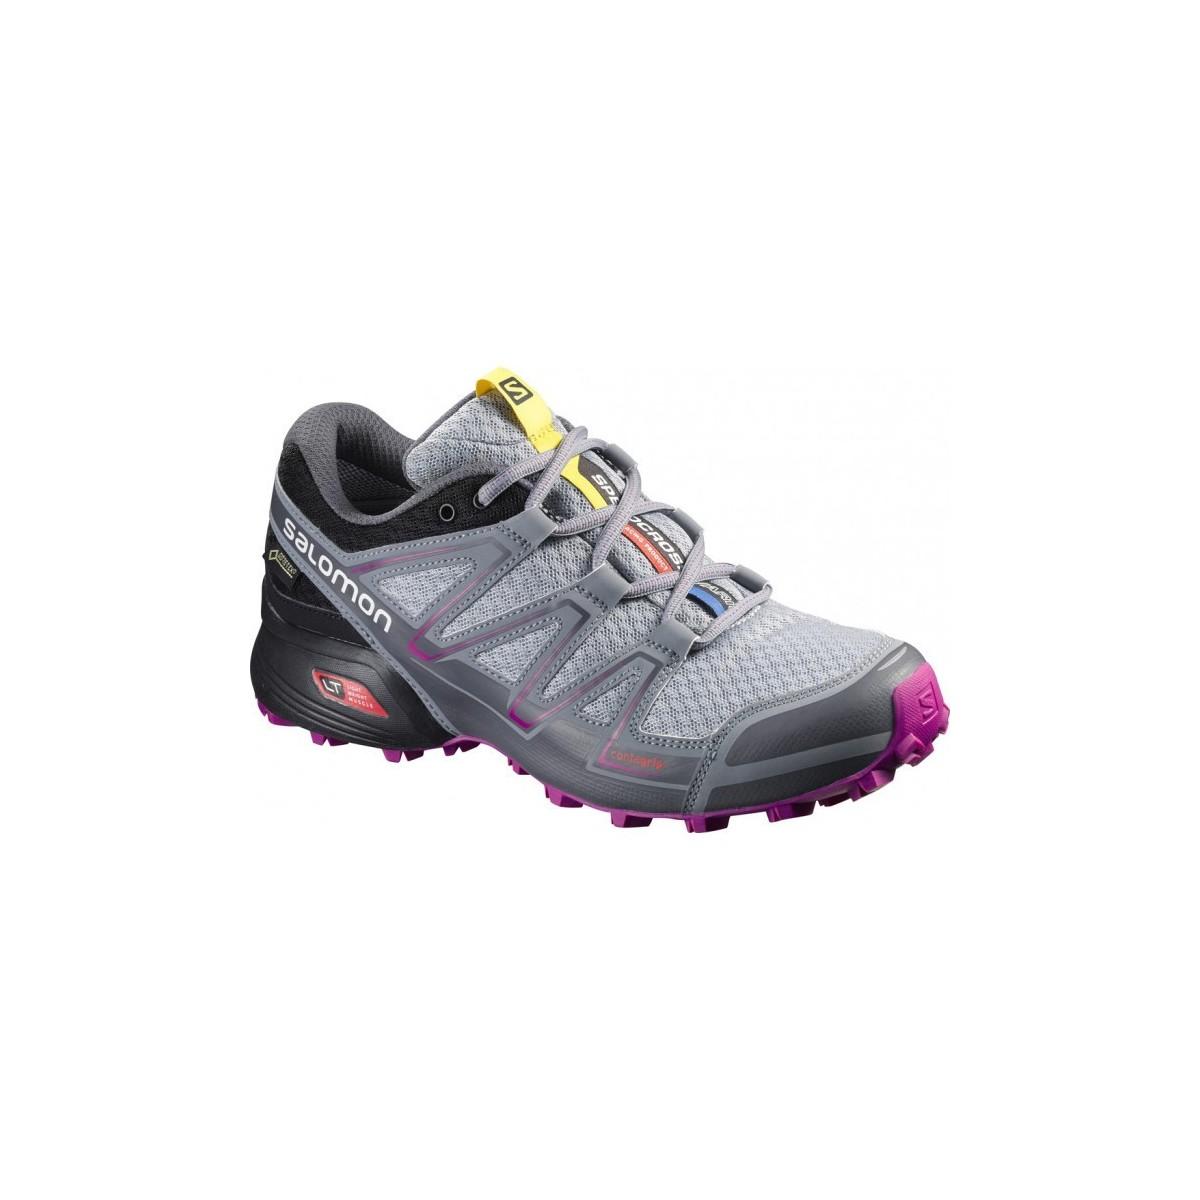 SALOMON trail running shoes SPEEDCROSS VARIO GTX W grey Color Grey Size 5.5